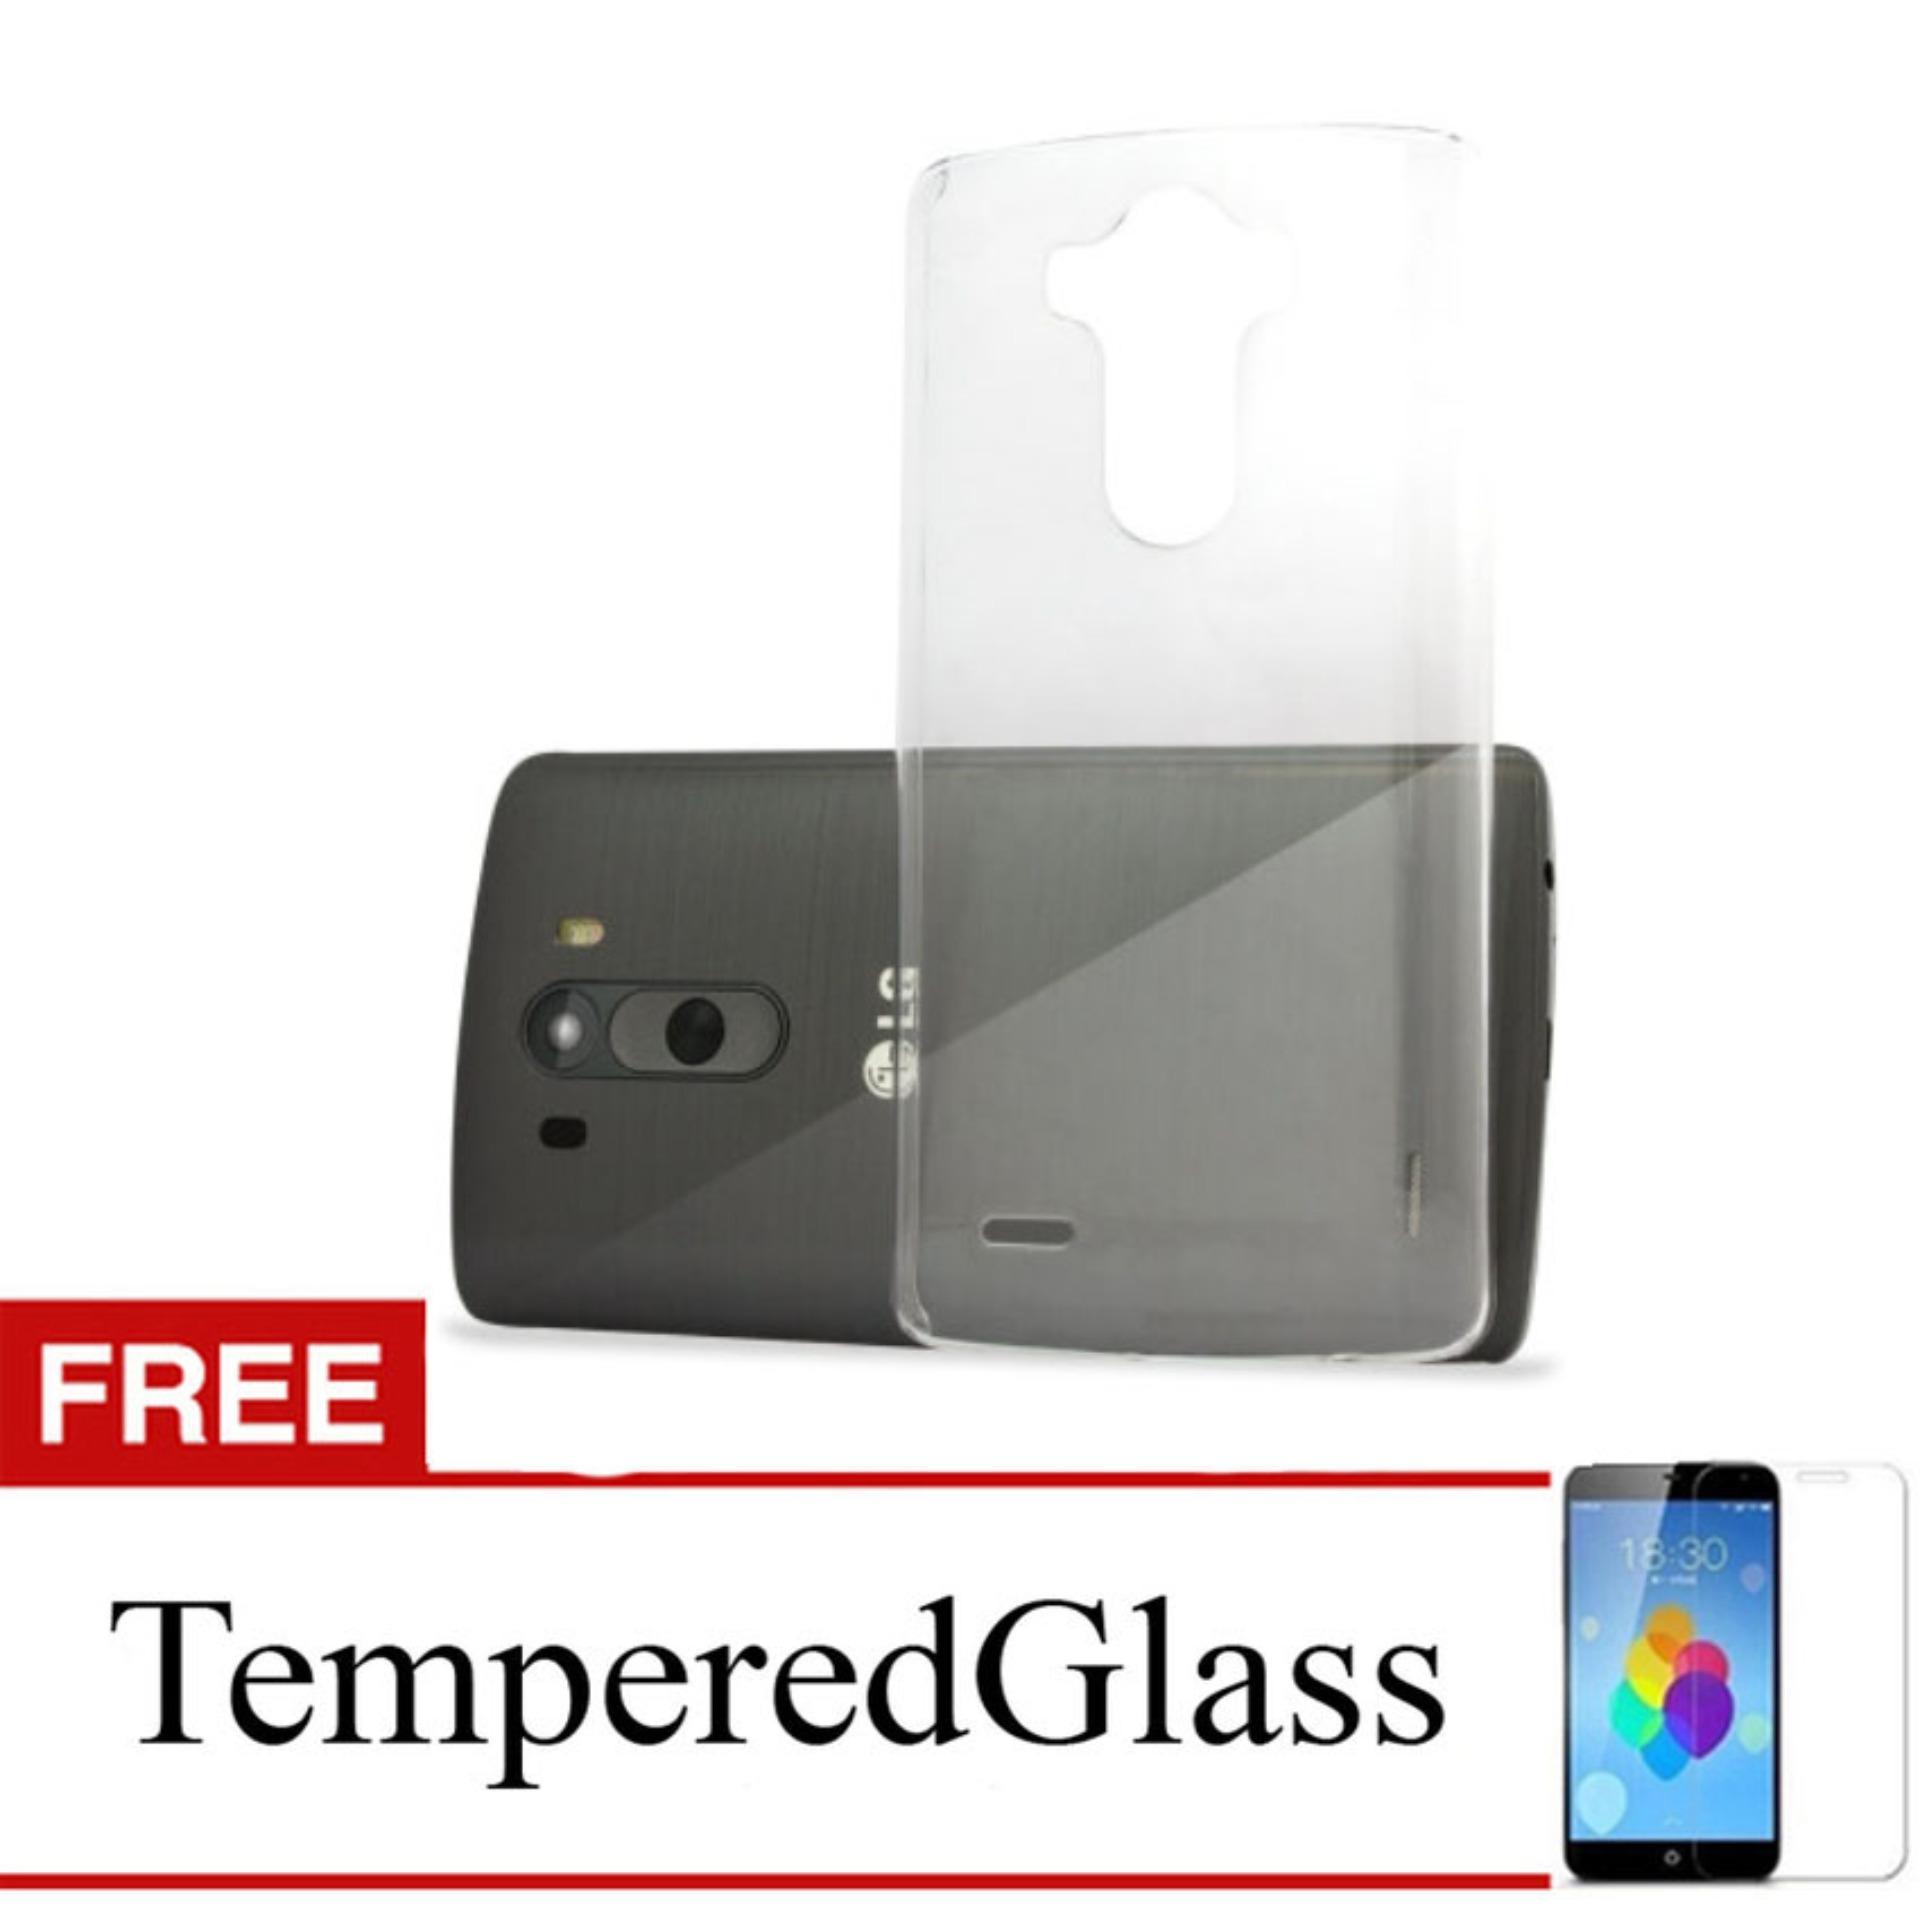 Case for LG V10 - Clear + Gratis Tempered Glass - Ultra Thin Soft Case